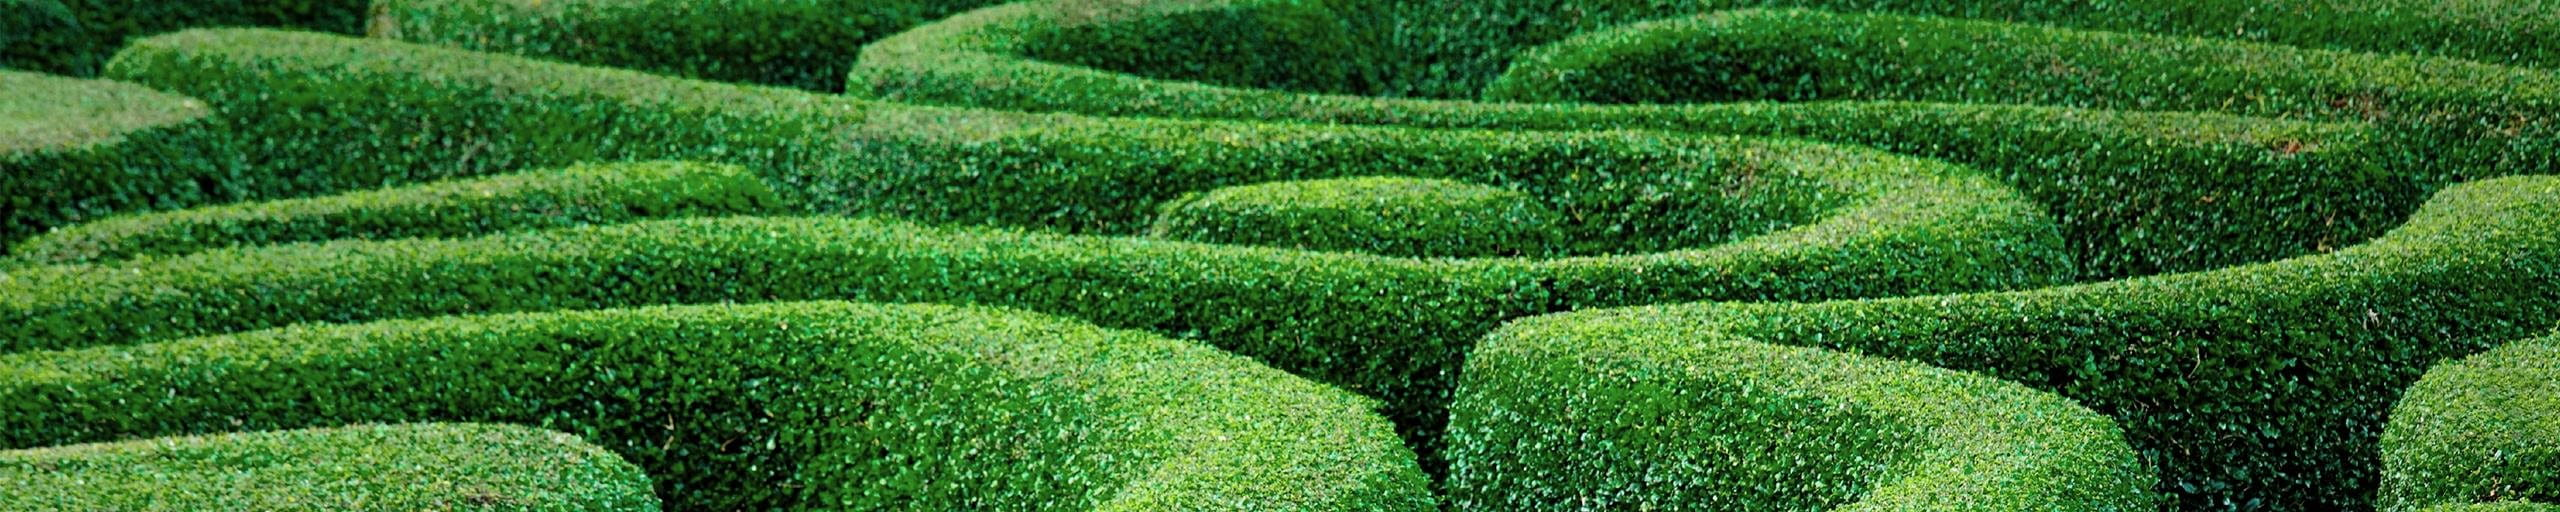 A labyrinth.